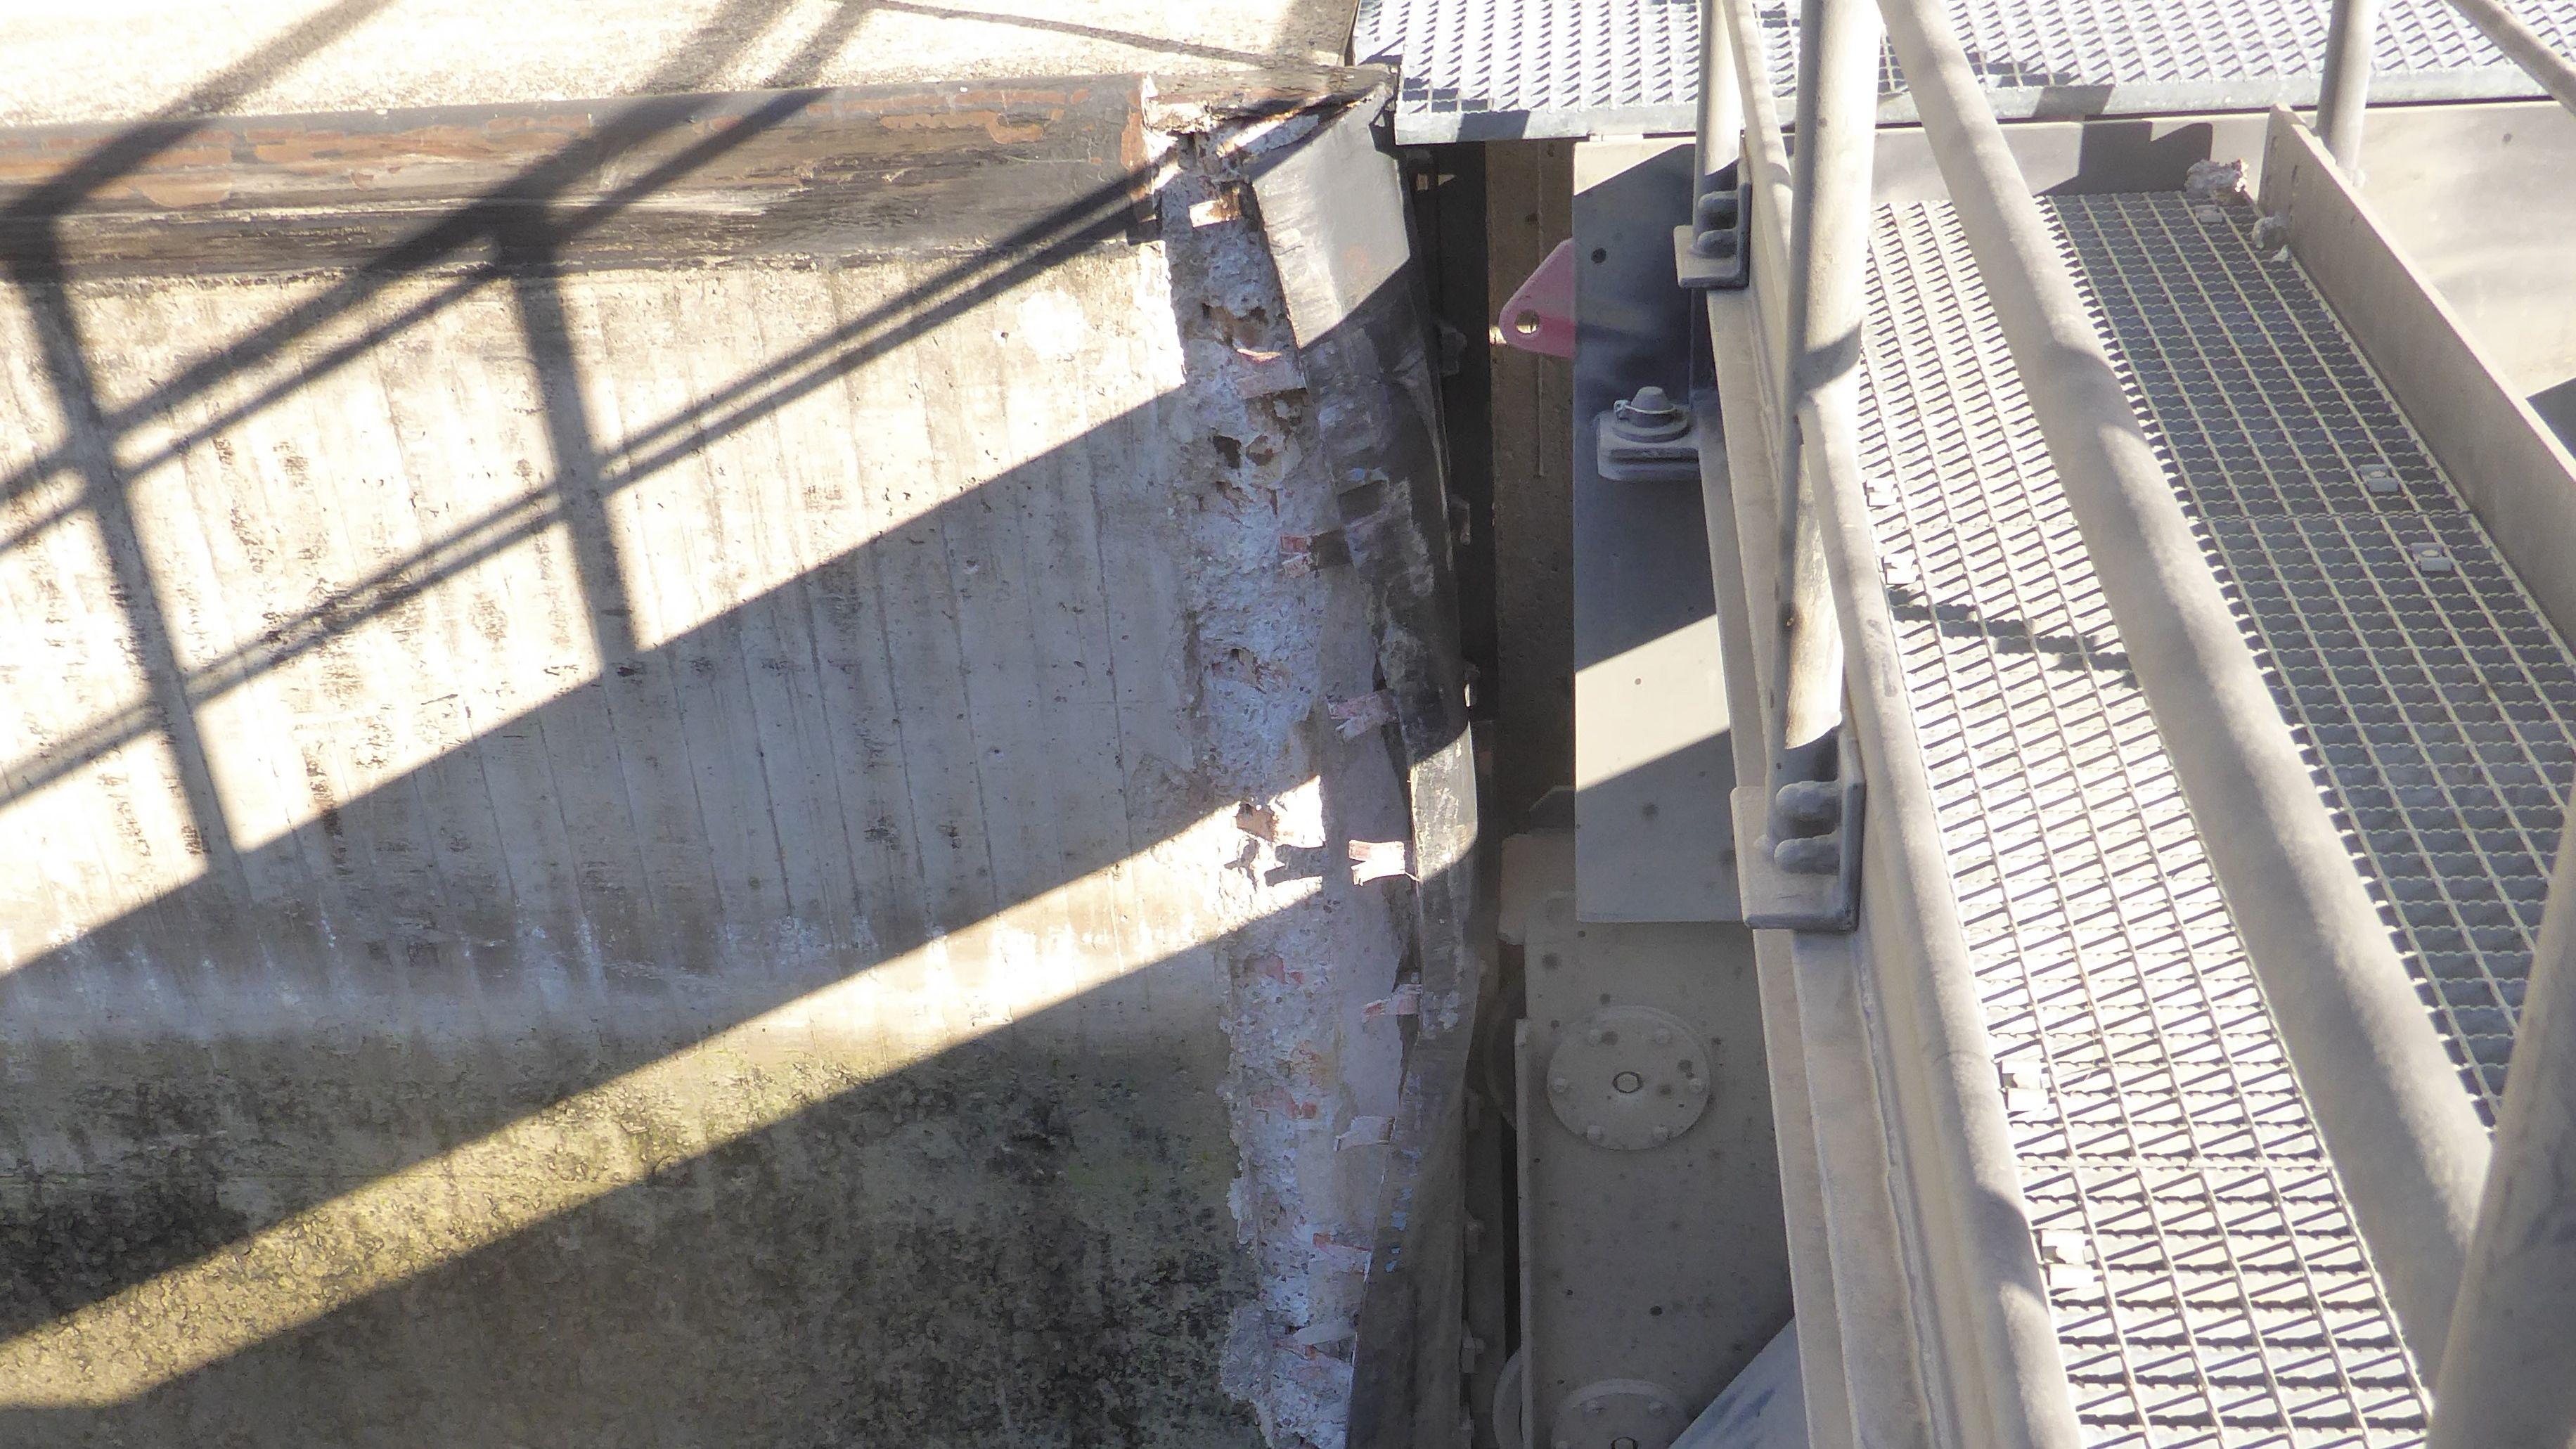 Der beschädigte Kantenschutz am Schleusentor